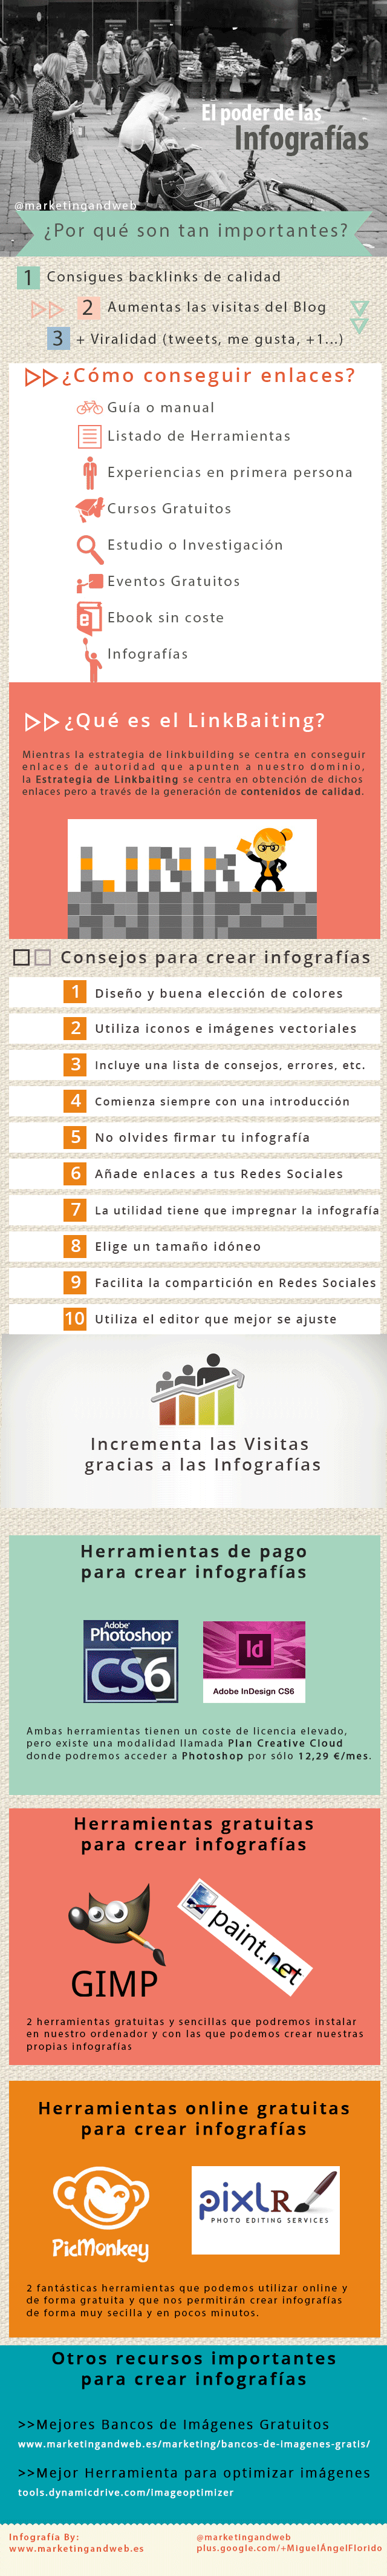 Infografia - infografia-el-poder-...